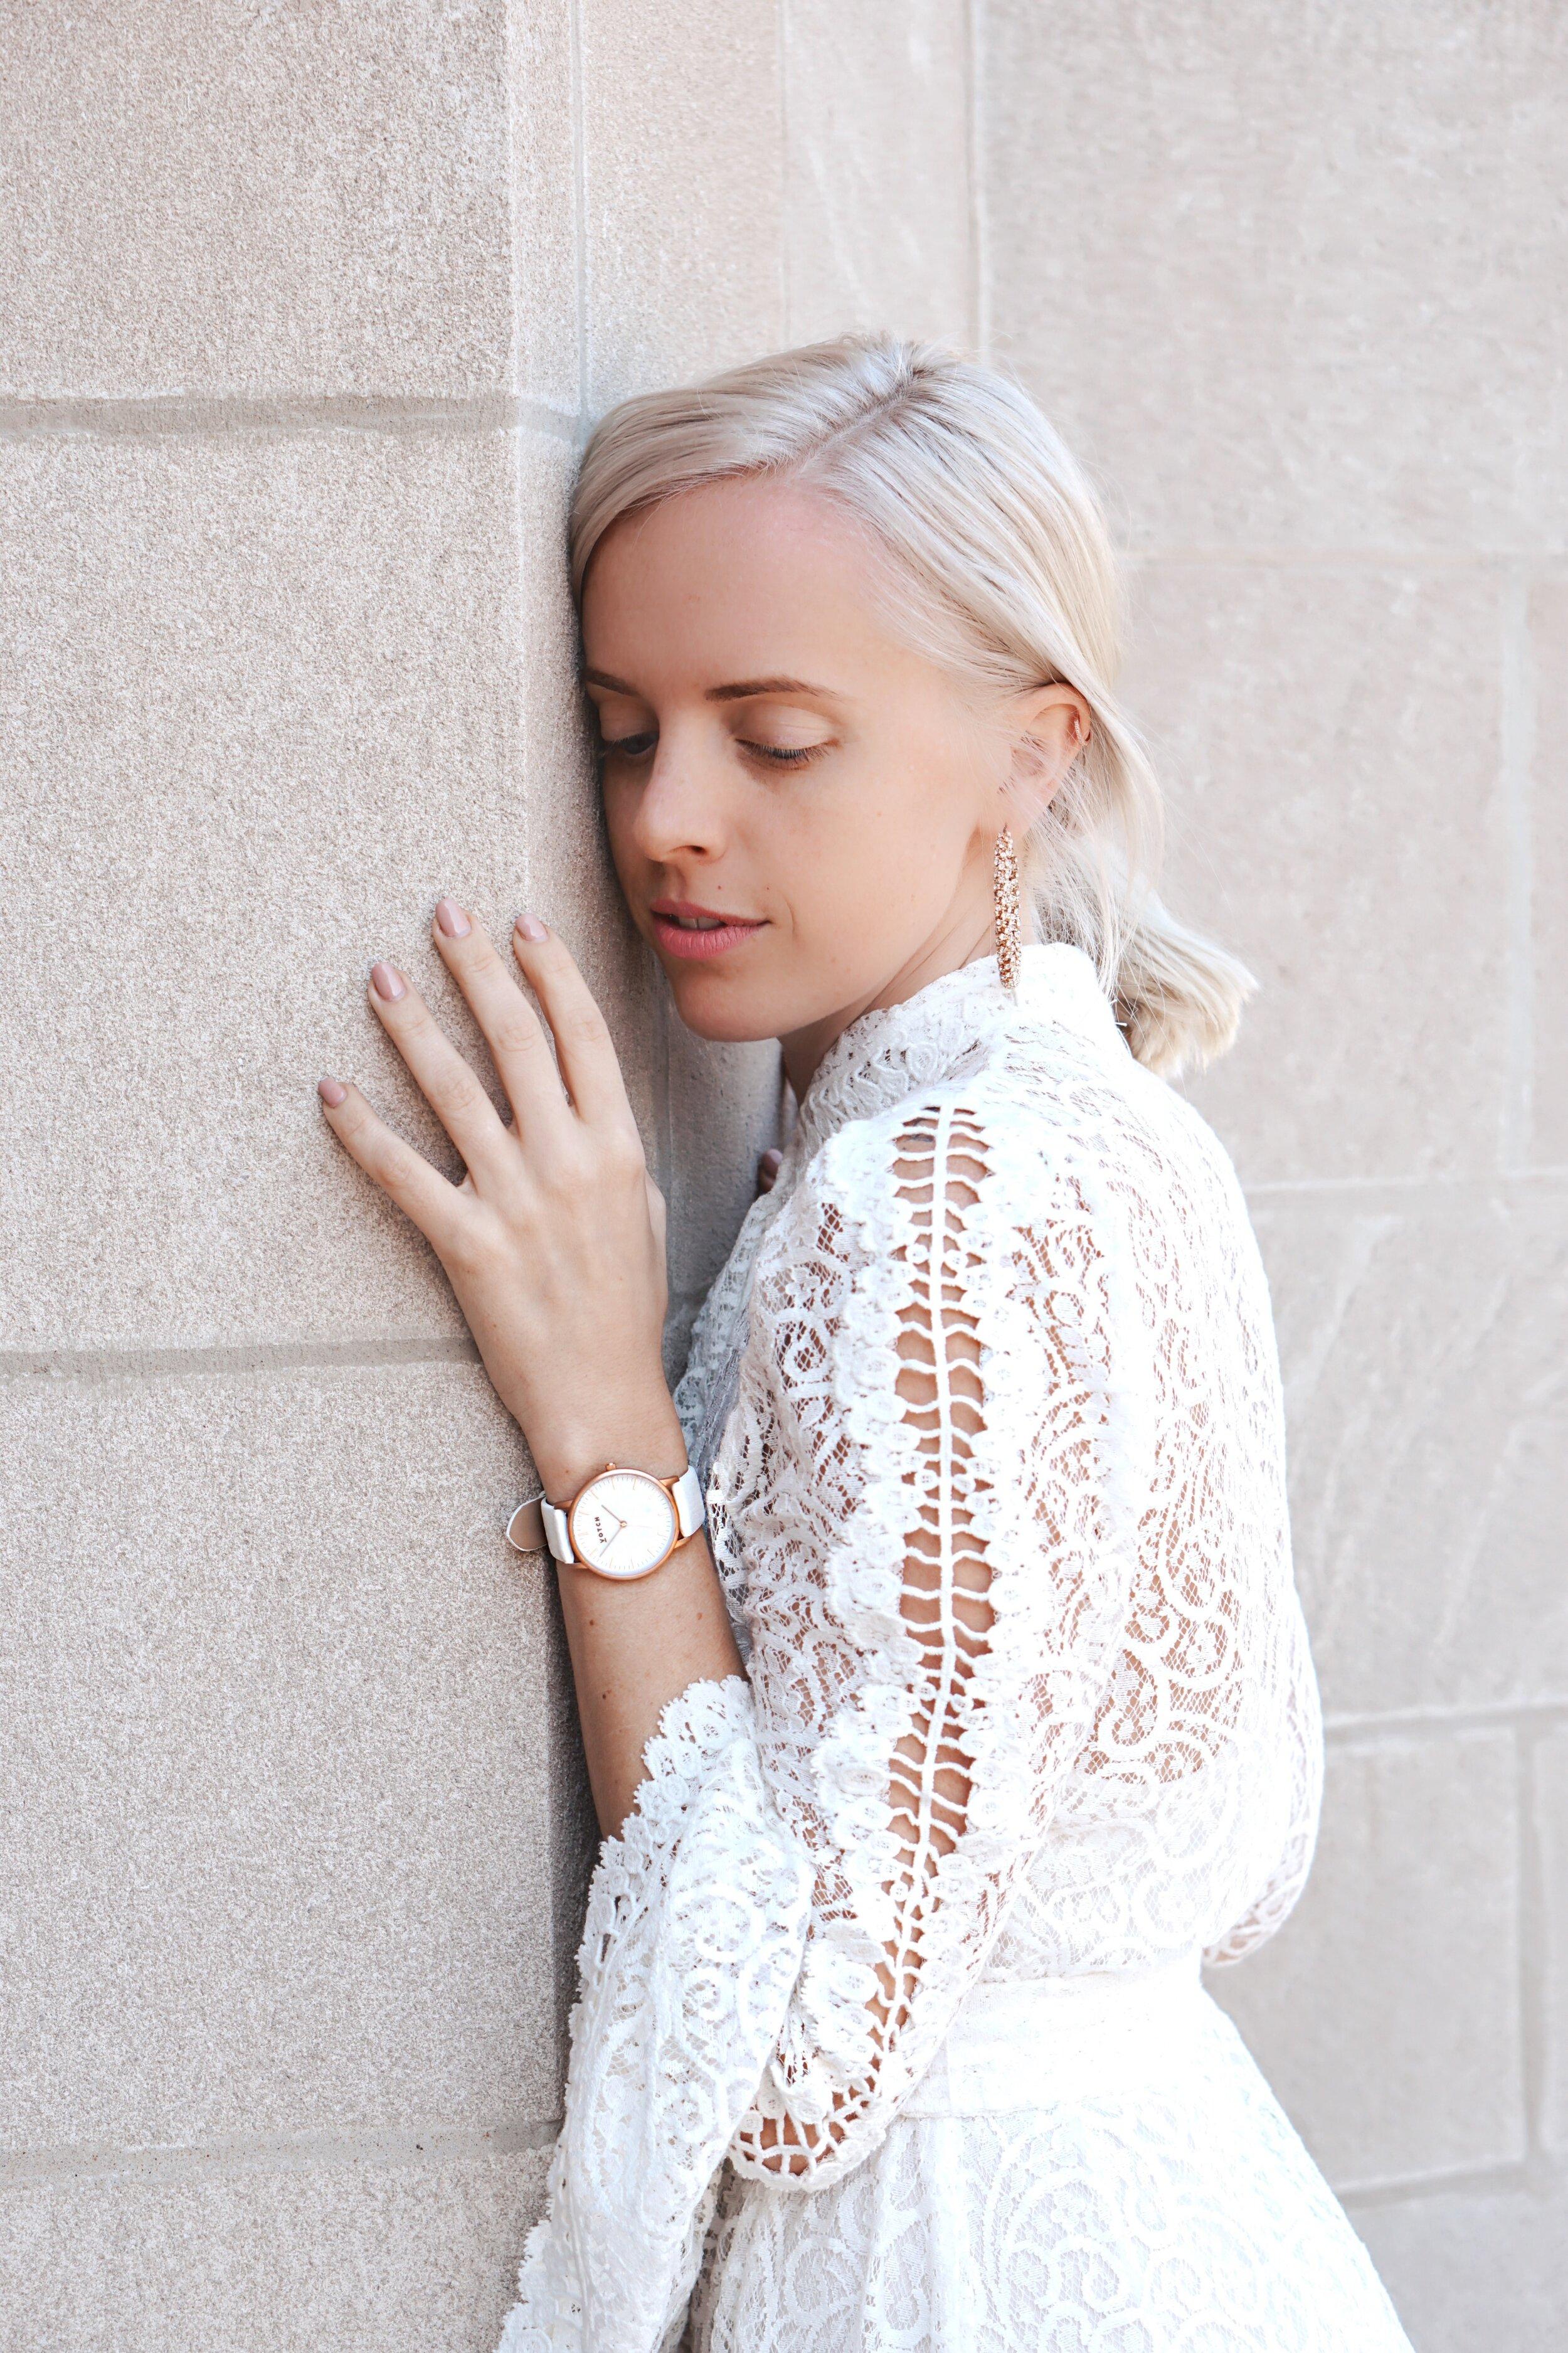 Vegan Watch, Rose Gold Watch, Cruelty-Free Fashion, Sararose Krenger, Chicagos Best Blogger, Fashion Stylist, Chicago Style